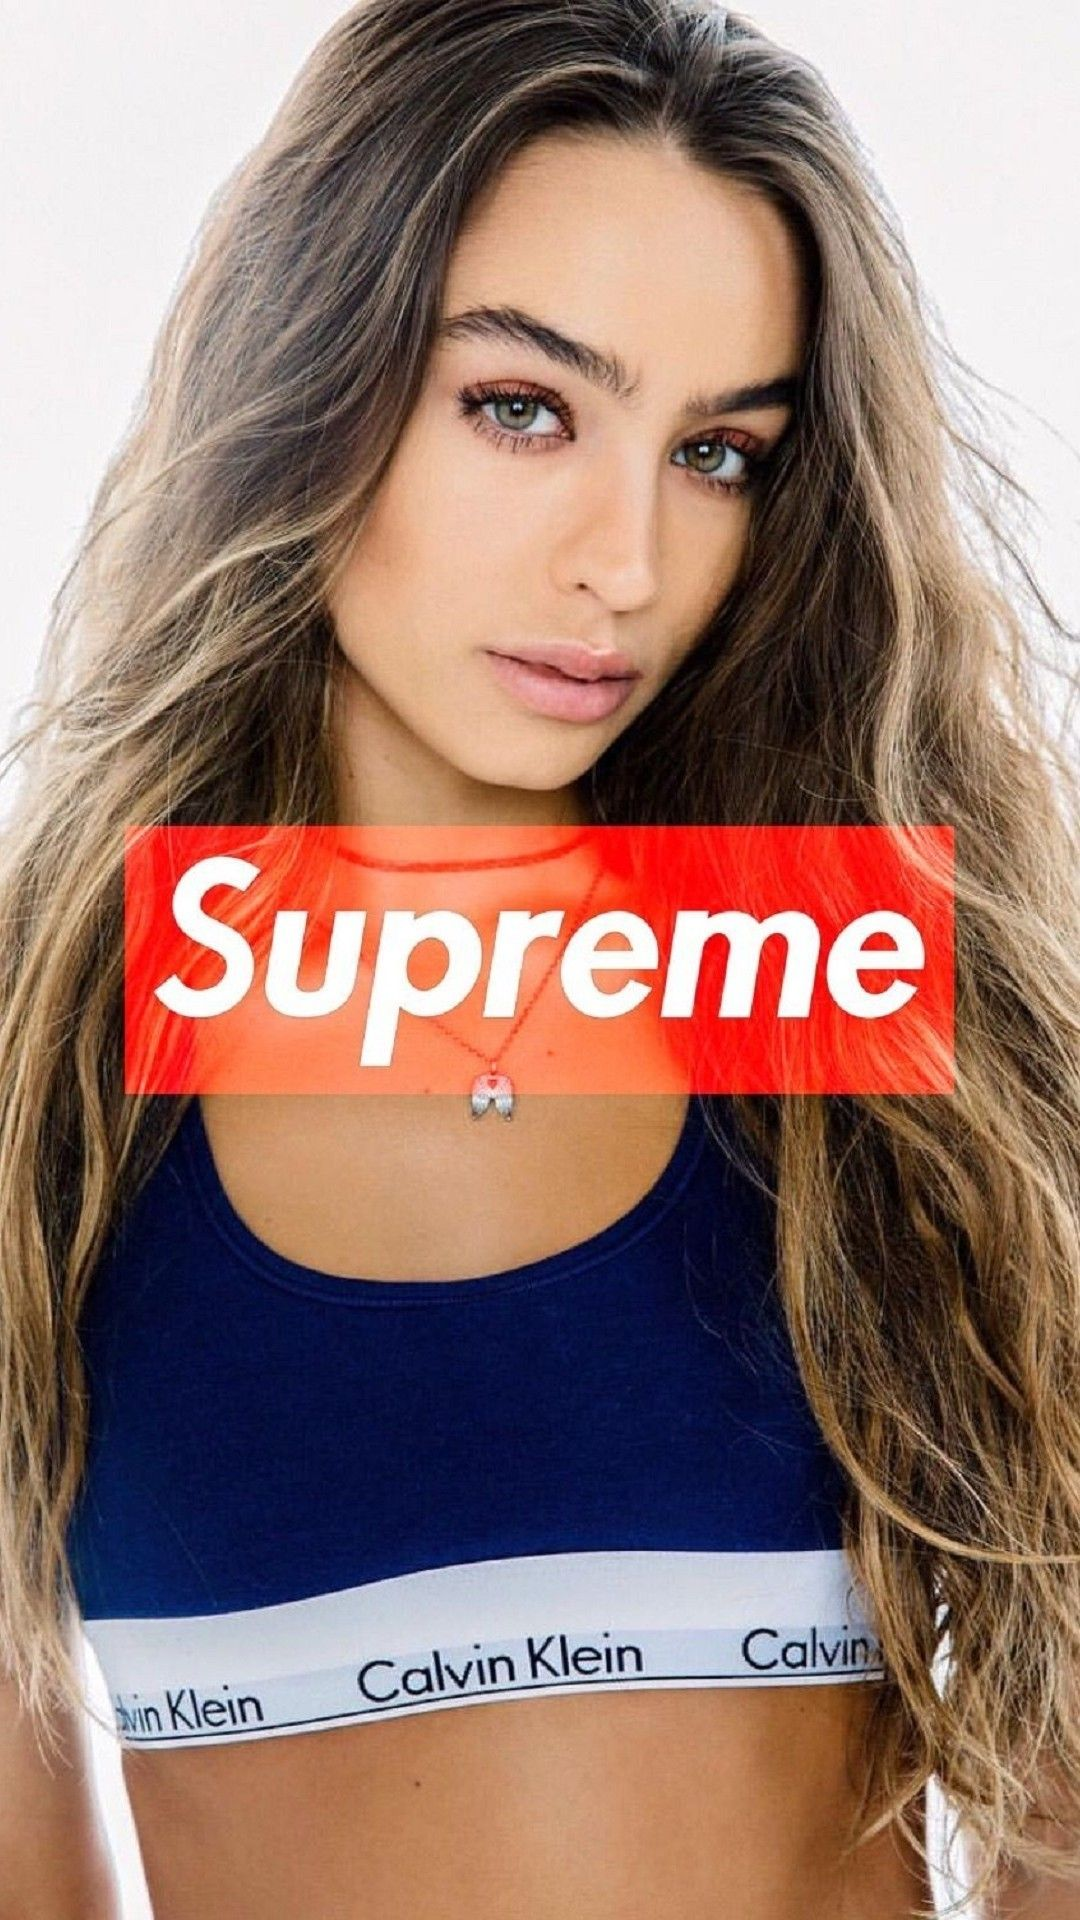 Sommeray In 2020 Supreme Girls Supreme Wallpaper Supreme Brand